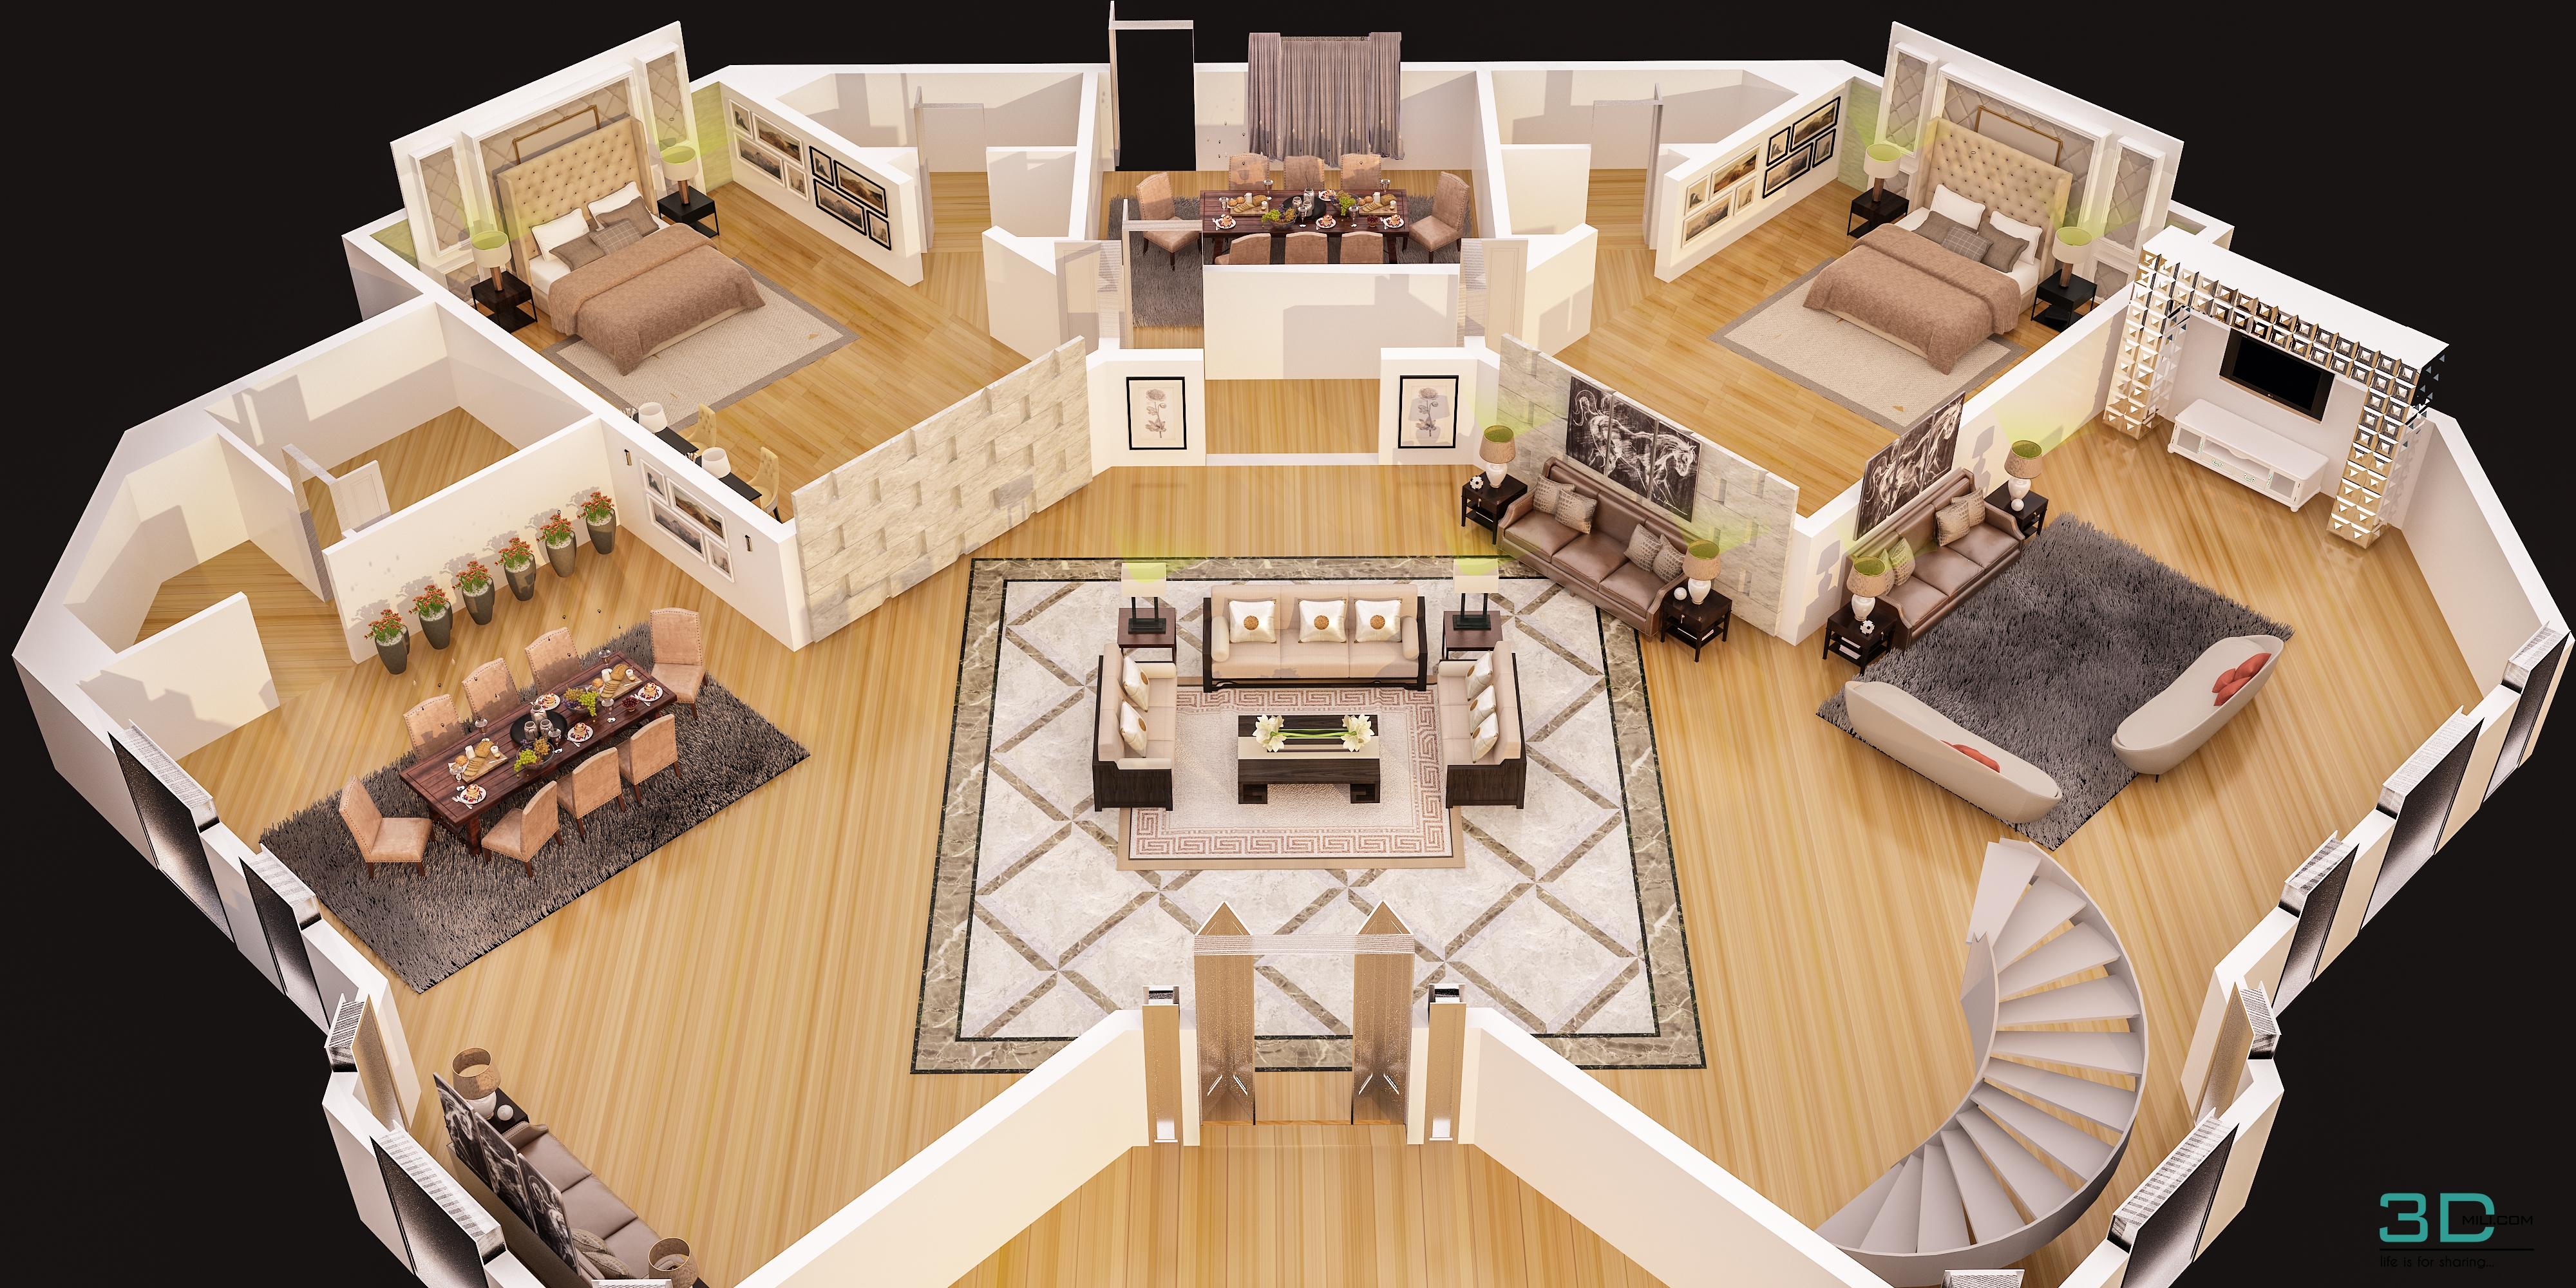 3d Floor Plan Of Luxury Villa Ground Floor 3dmili 2021 Download 3d Model Free 3d Models 3d Model Download 3dmili 2021 Download 3d Model Free 3d Models 3d Model Download